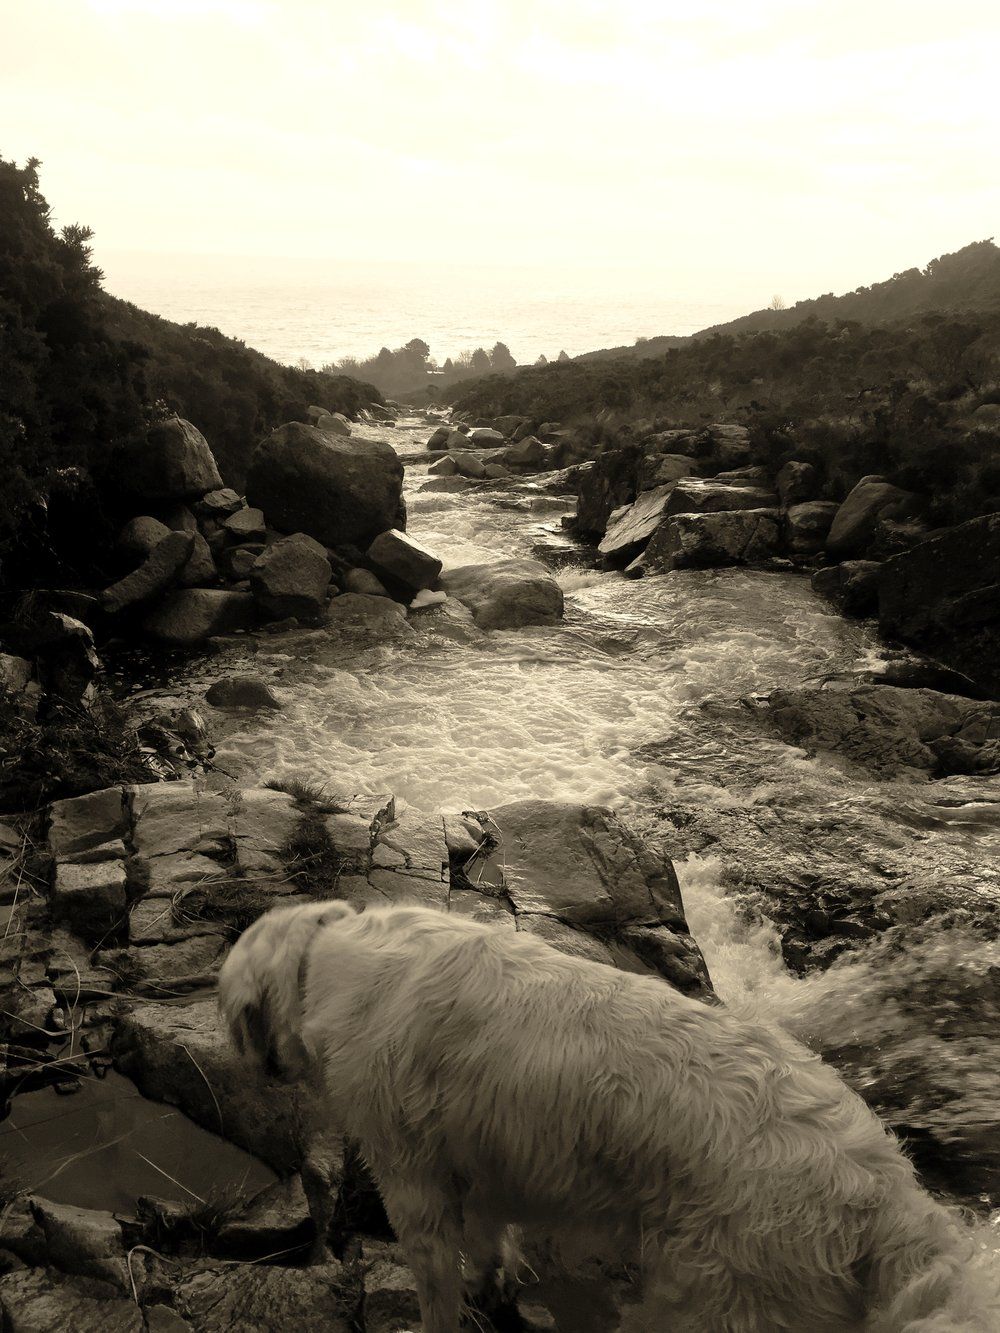 dog_river_bw_slieve_donard_newcastle_tollymore_mourne_mountains_ni_explorer_niexplorer_northern_ireland_blog.jpg